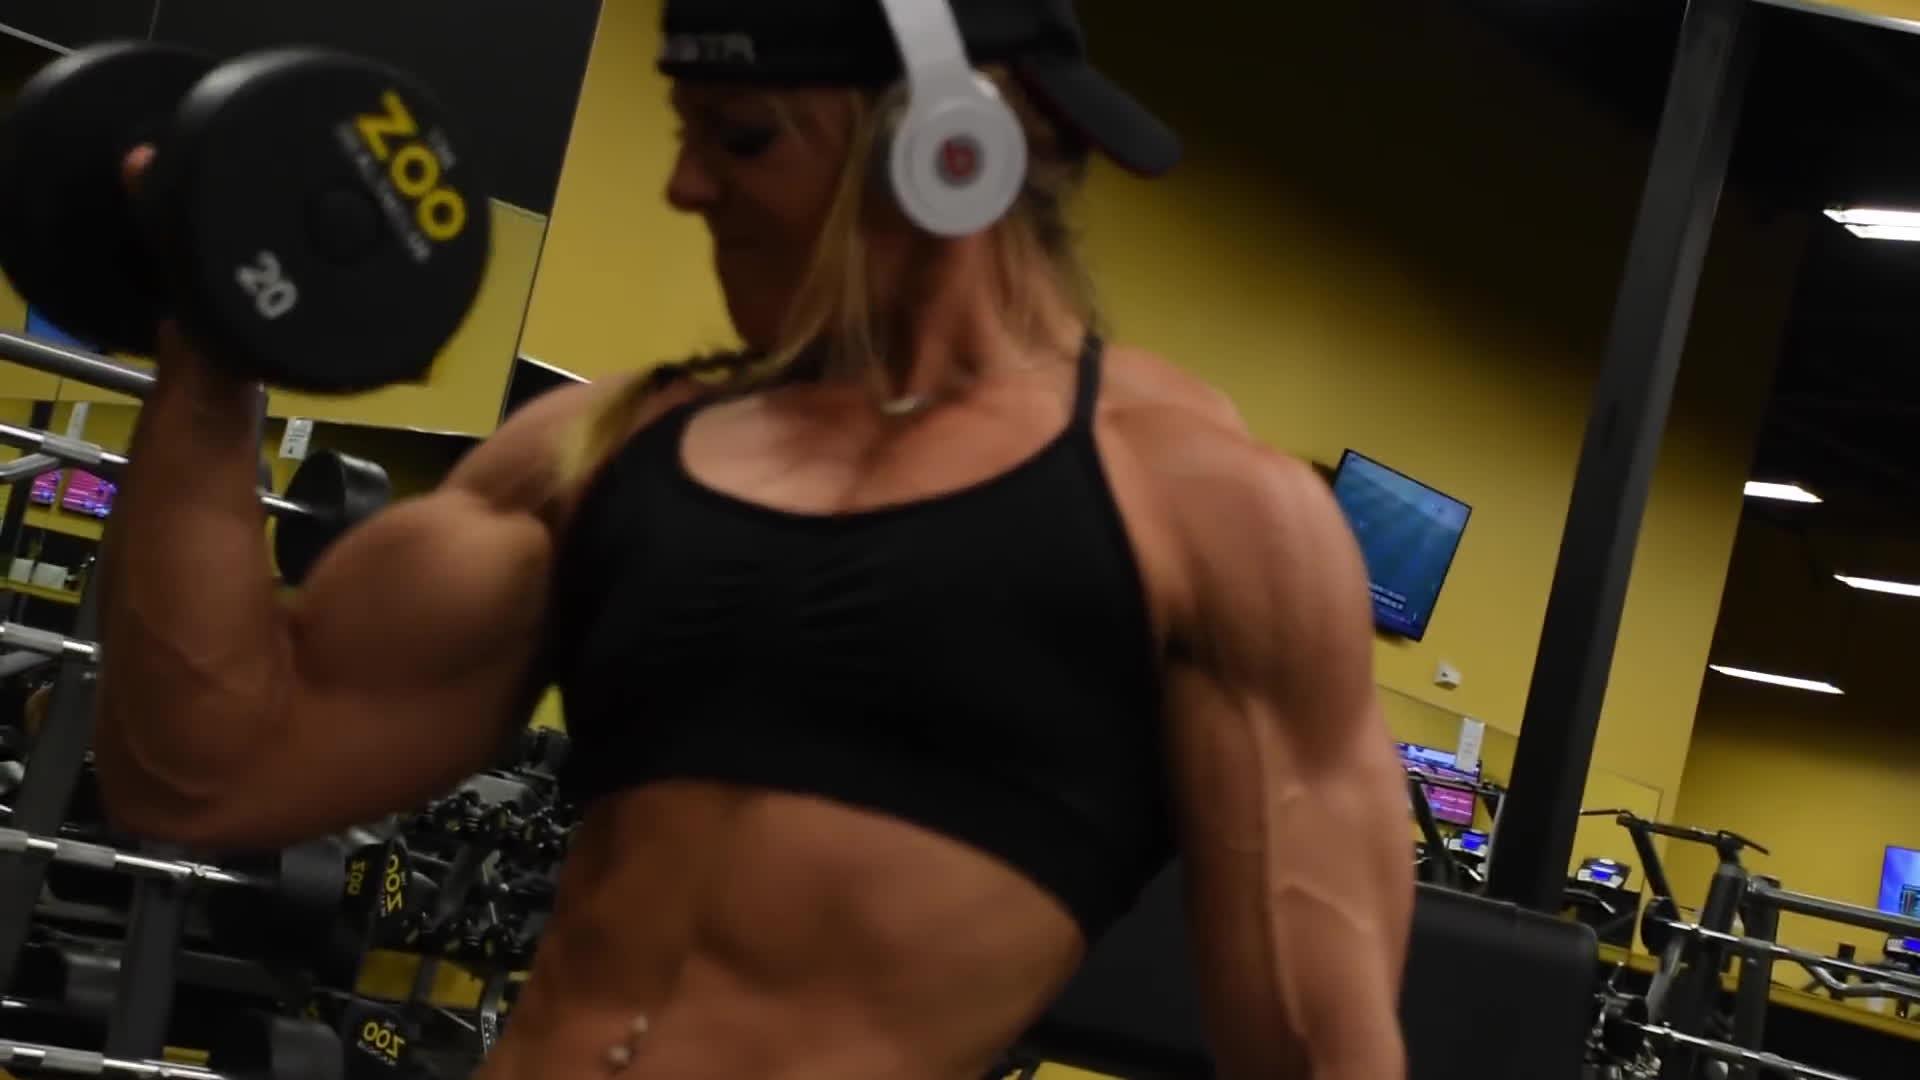 dani reardon, danielle reardon, lil monstar, Dani Reardon - Trains Arms 3 Weeks Out GIFs